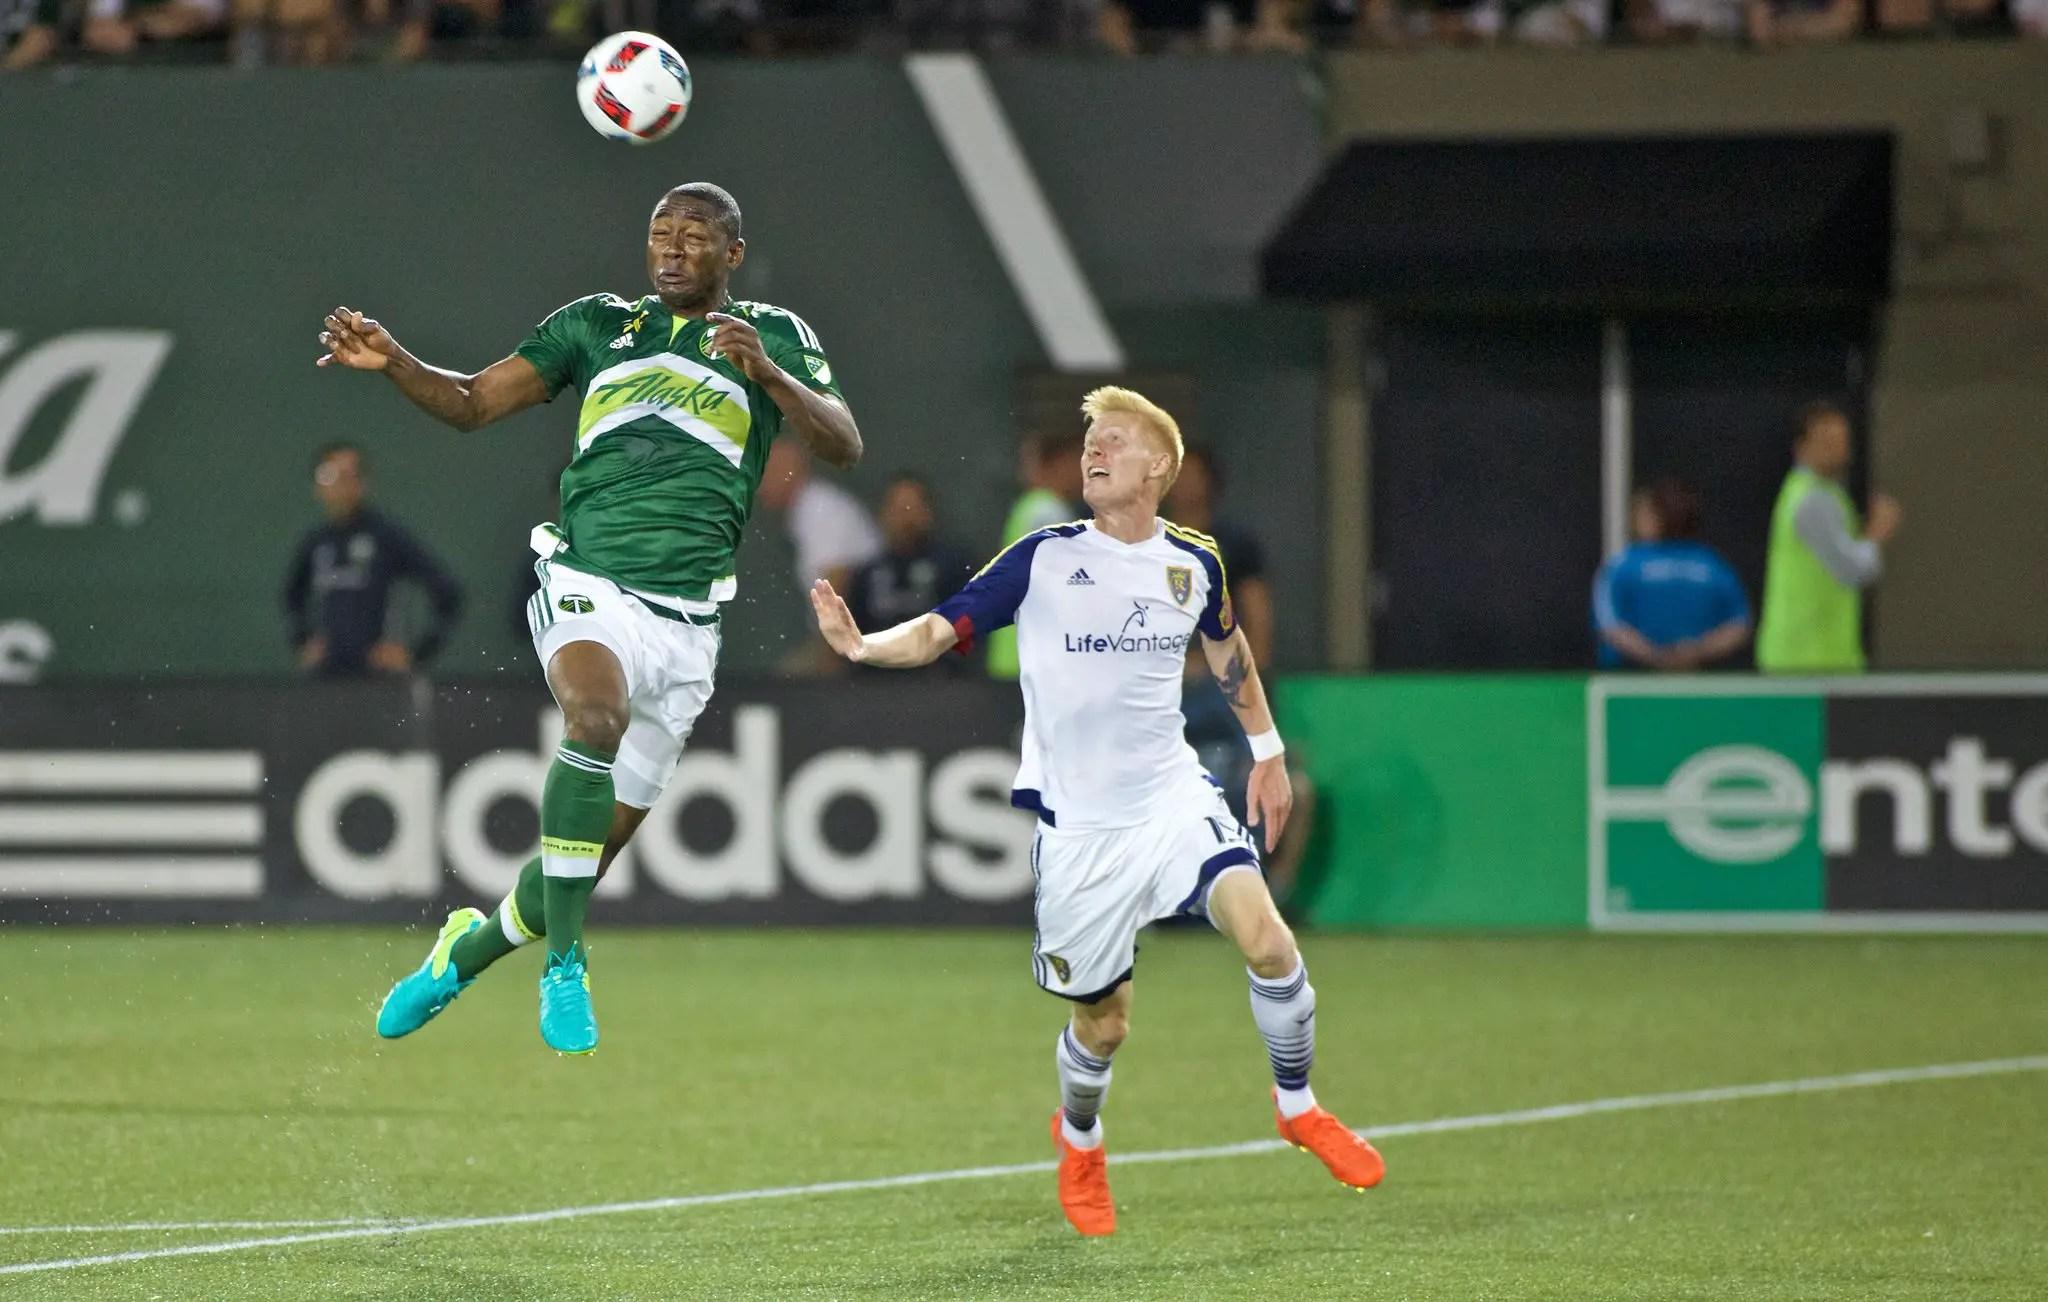 Adi Scores As Portland Timbers Lose Champions League Clash